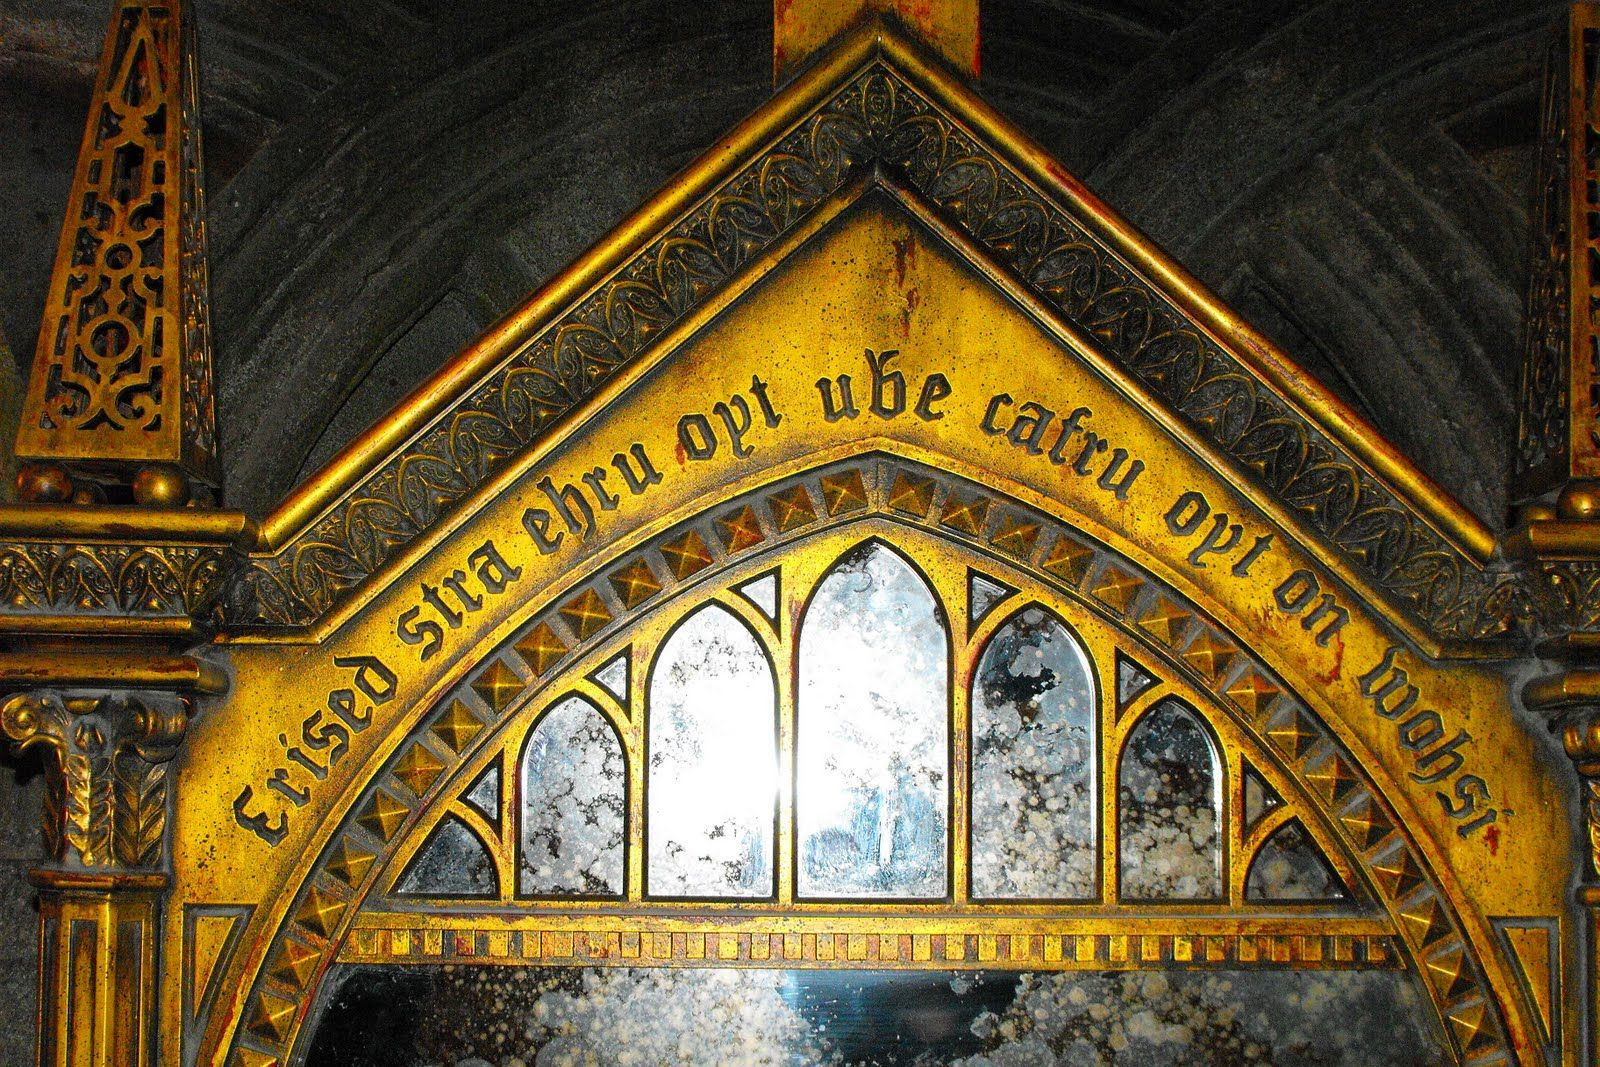 mirror of erised inscription i am i said pinterest